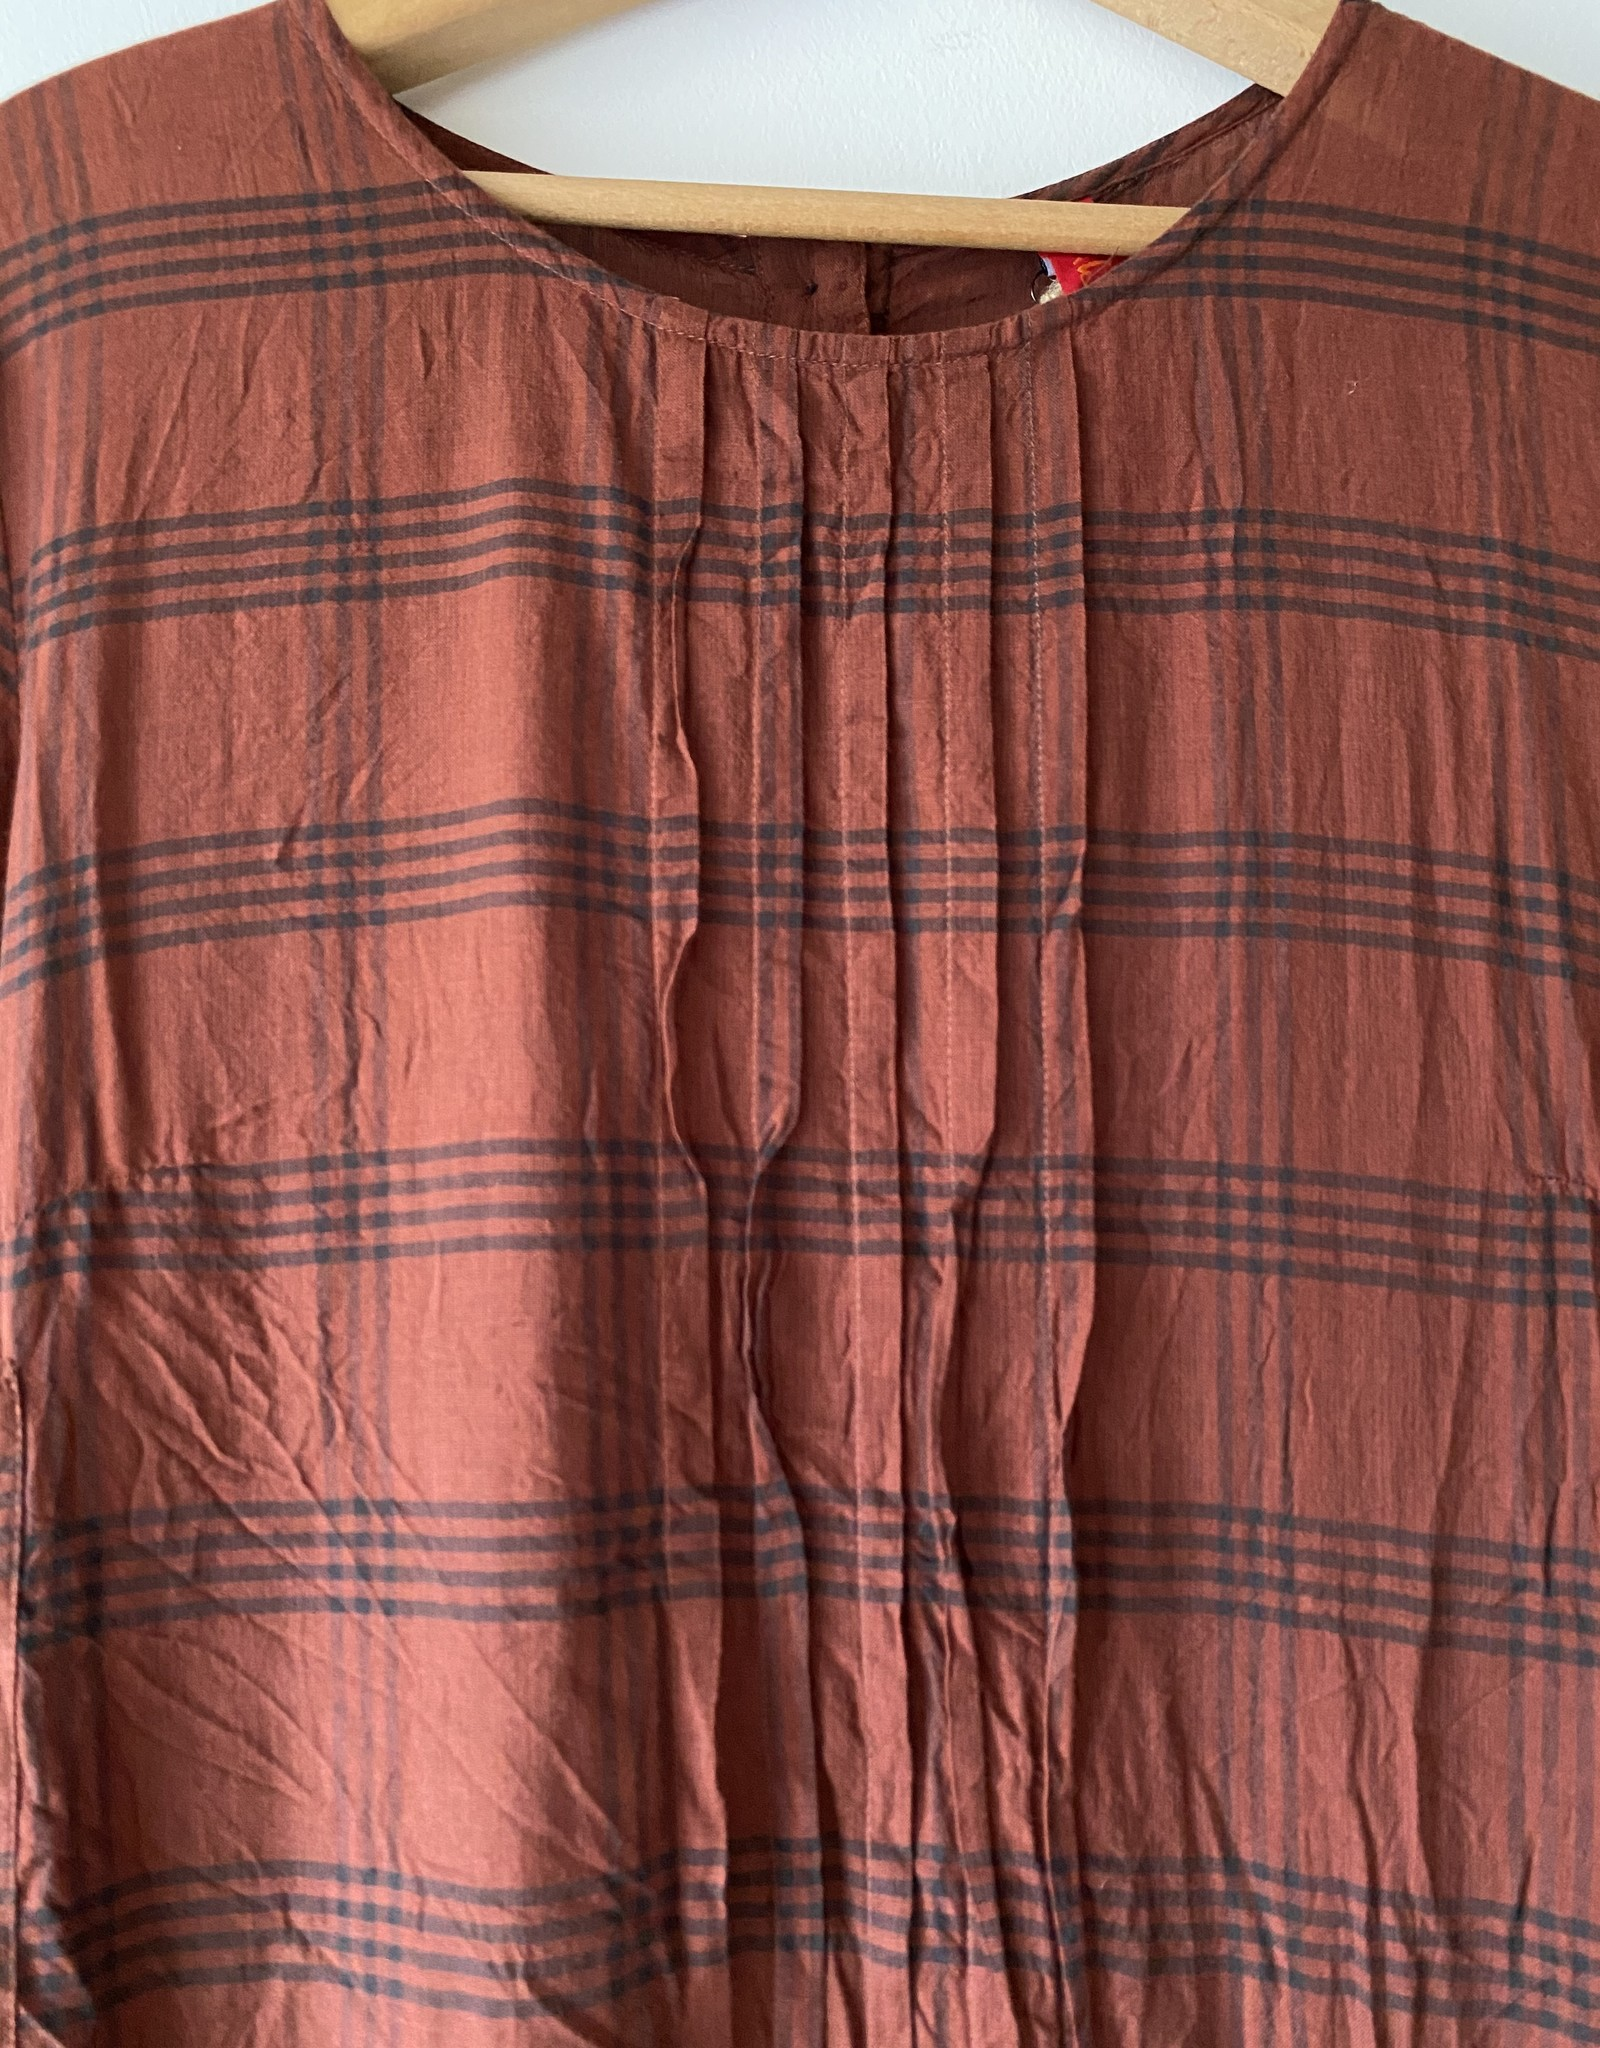 EWA I WALLA 55666 EWA I WALLA DRESS